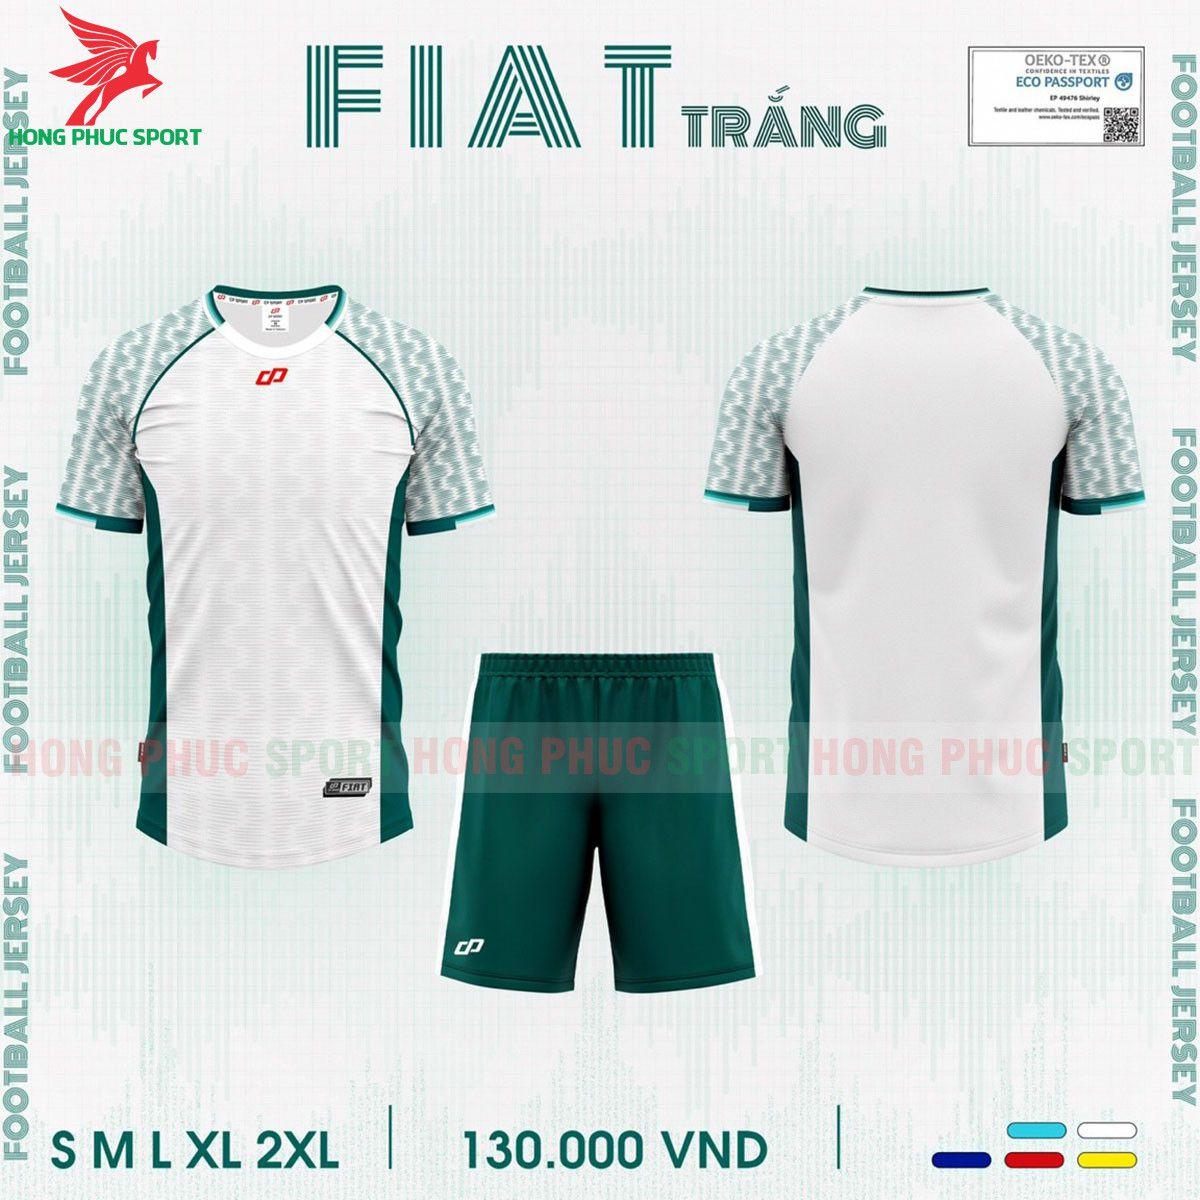 https://cdn.hongphucsport.com/unsafe/s4.shopbay.vn/files/285/ao-bong-da-khong-logo-fiat-trang-1-60f5046209091.jpg